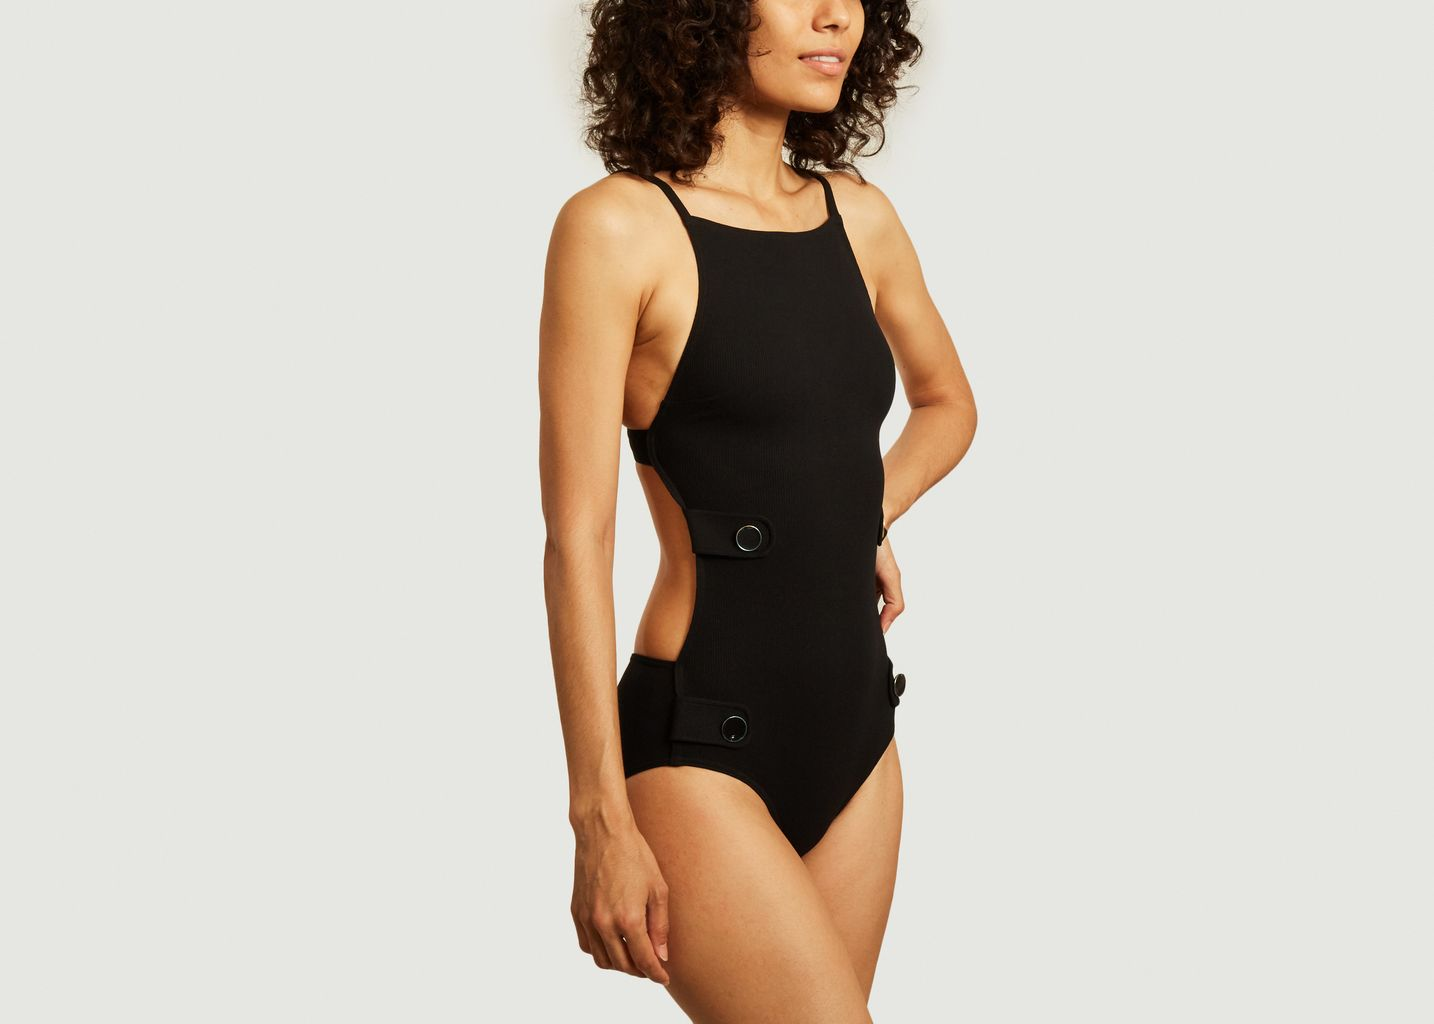 Maison Lejaby Womens Smoking Bustier Bikini Top